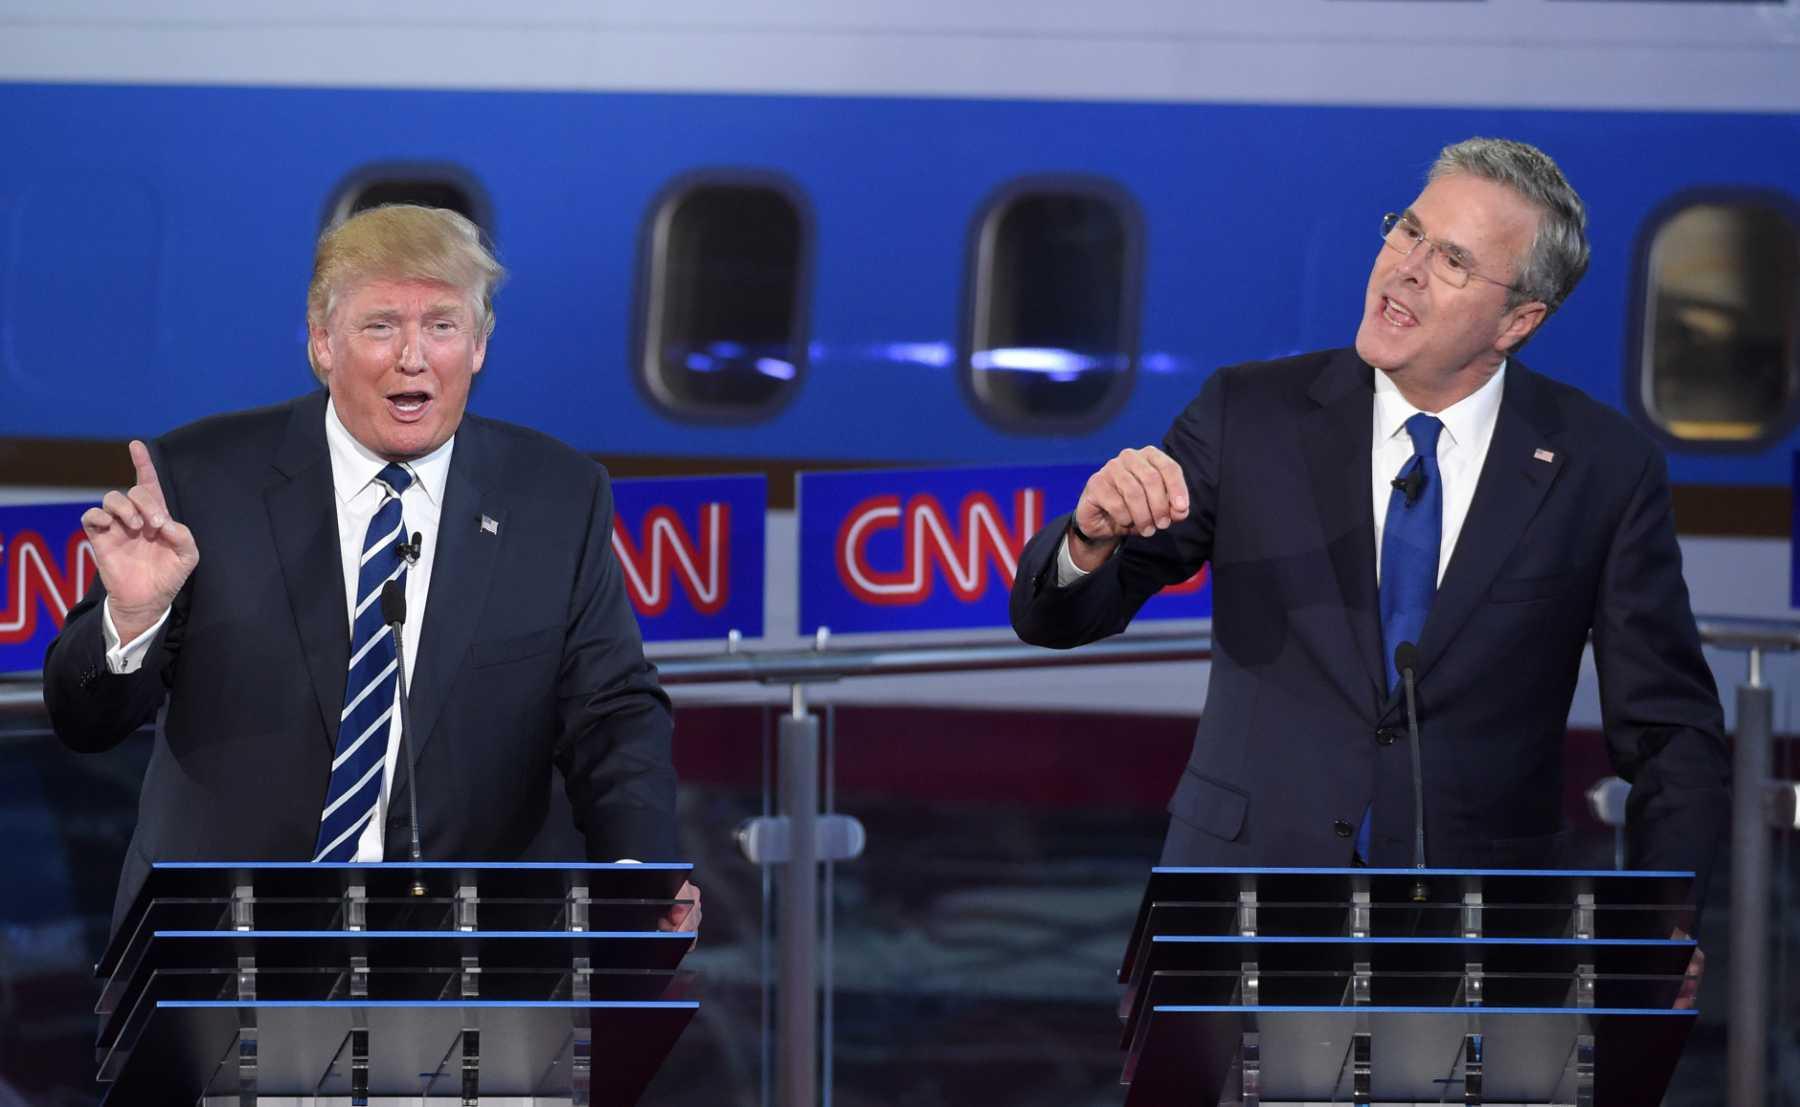 CNN's Republican Debate: Shouting, Name Calling, Self Praise And Trump Speak | Republican Debate